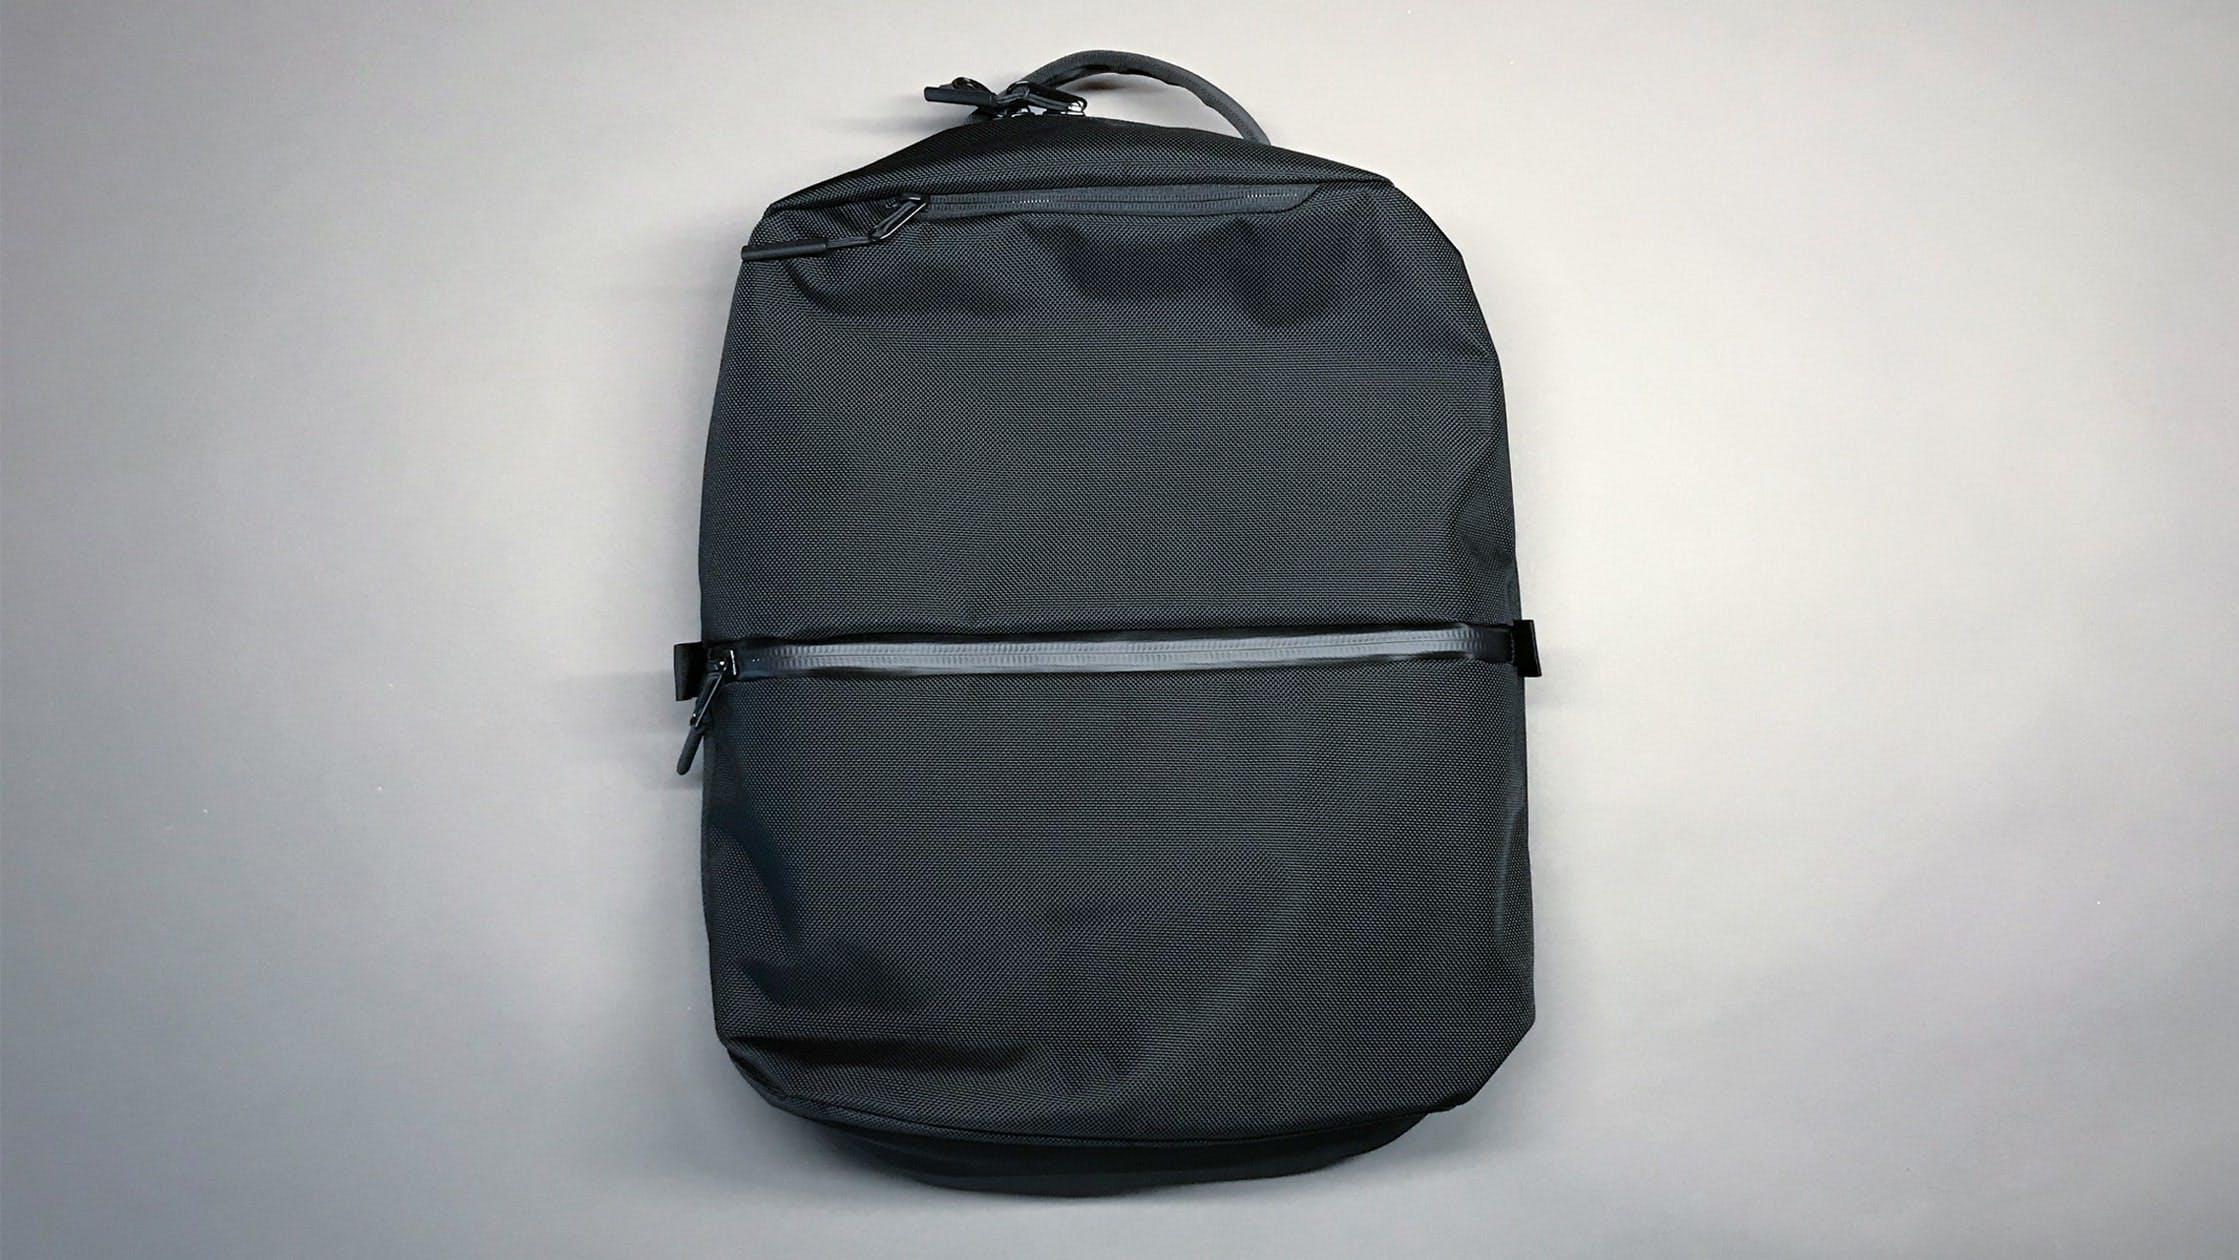 7626e58999d0 Aer Flight Pack Travel Backpack Review